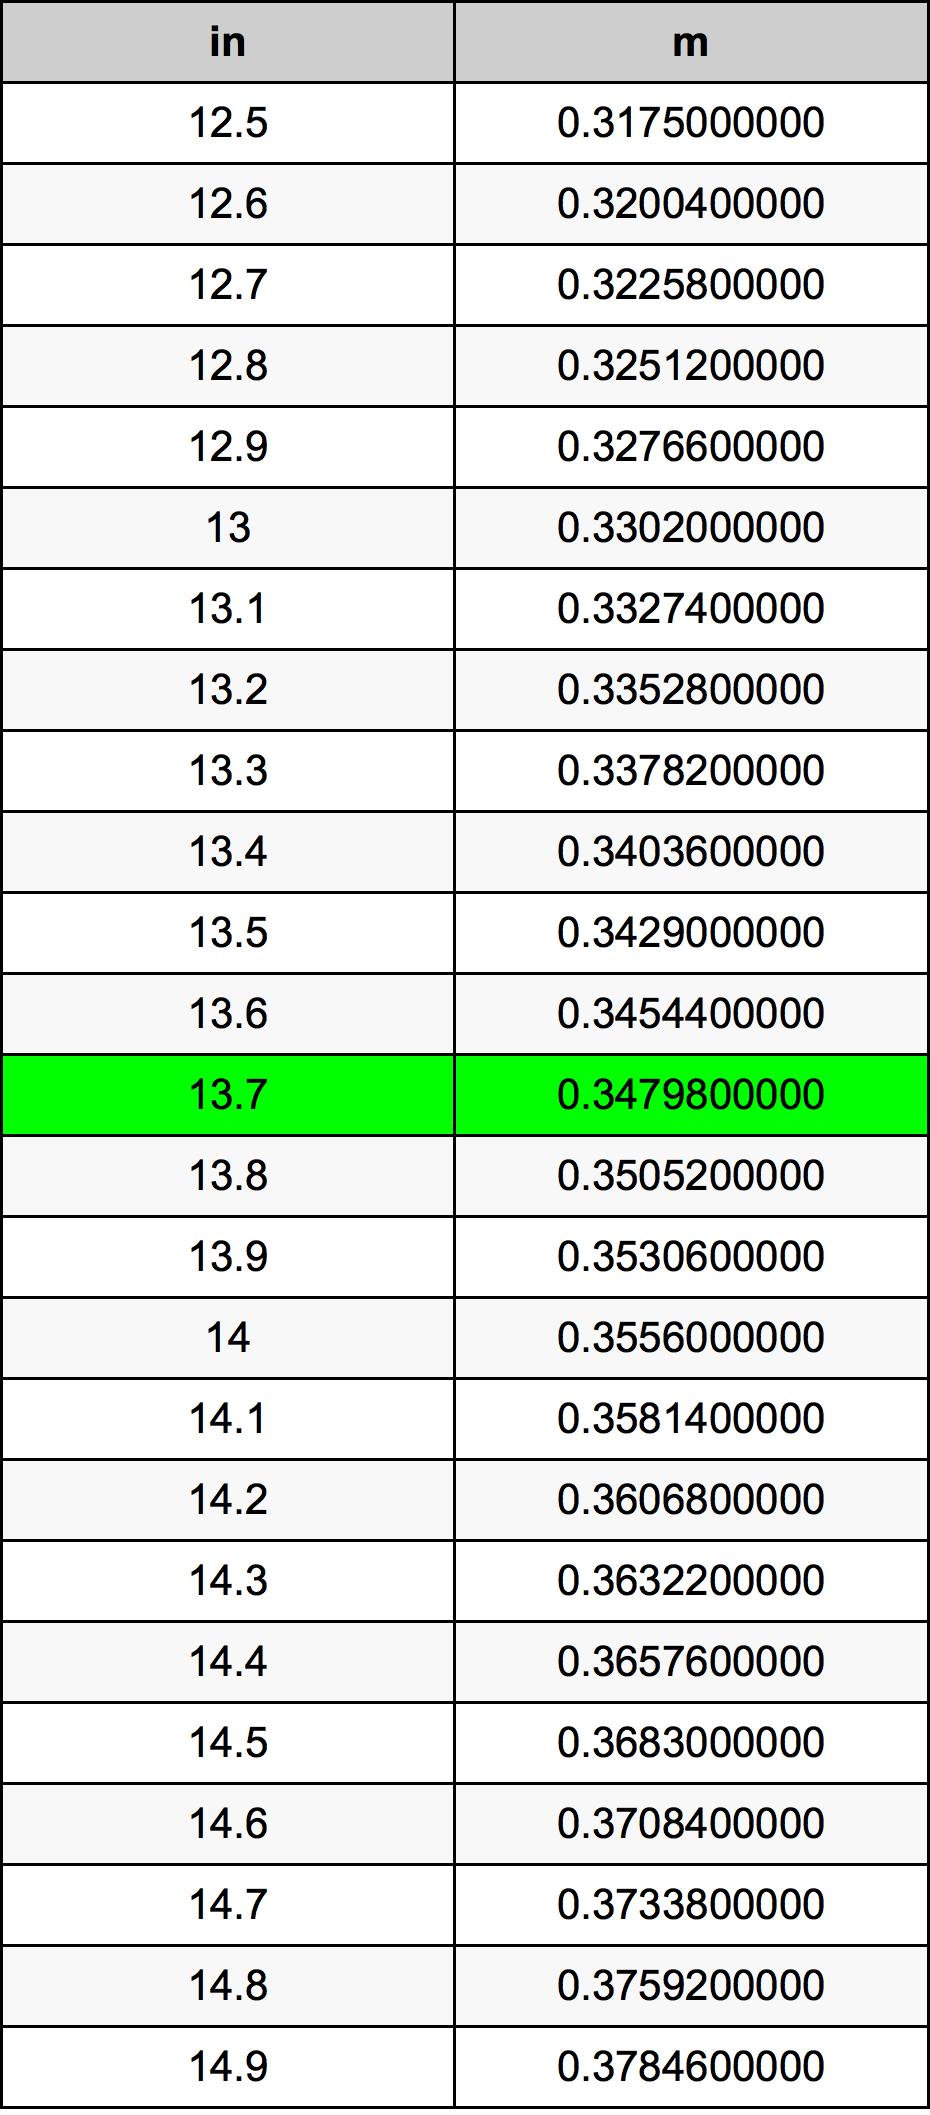 13.7 дюйм Таблица преобразования